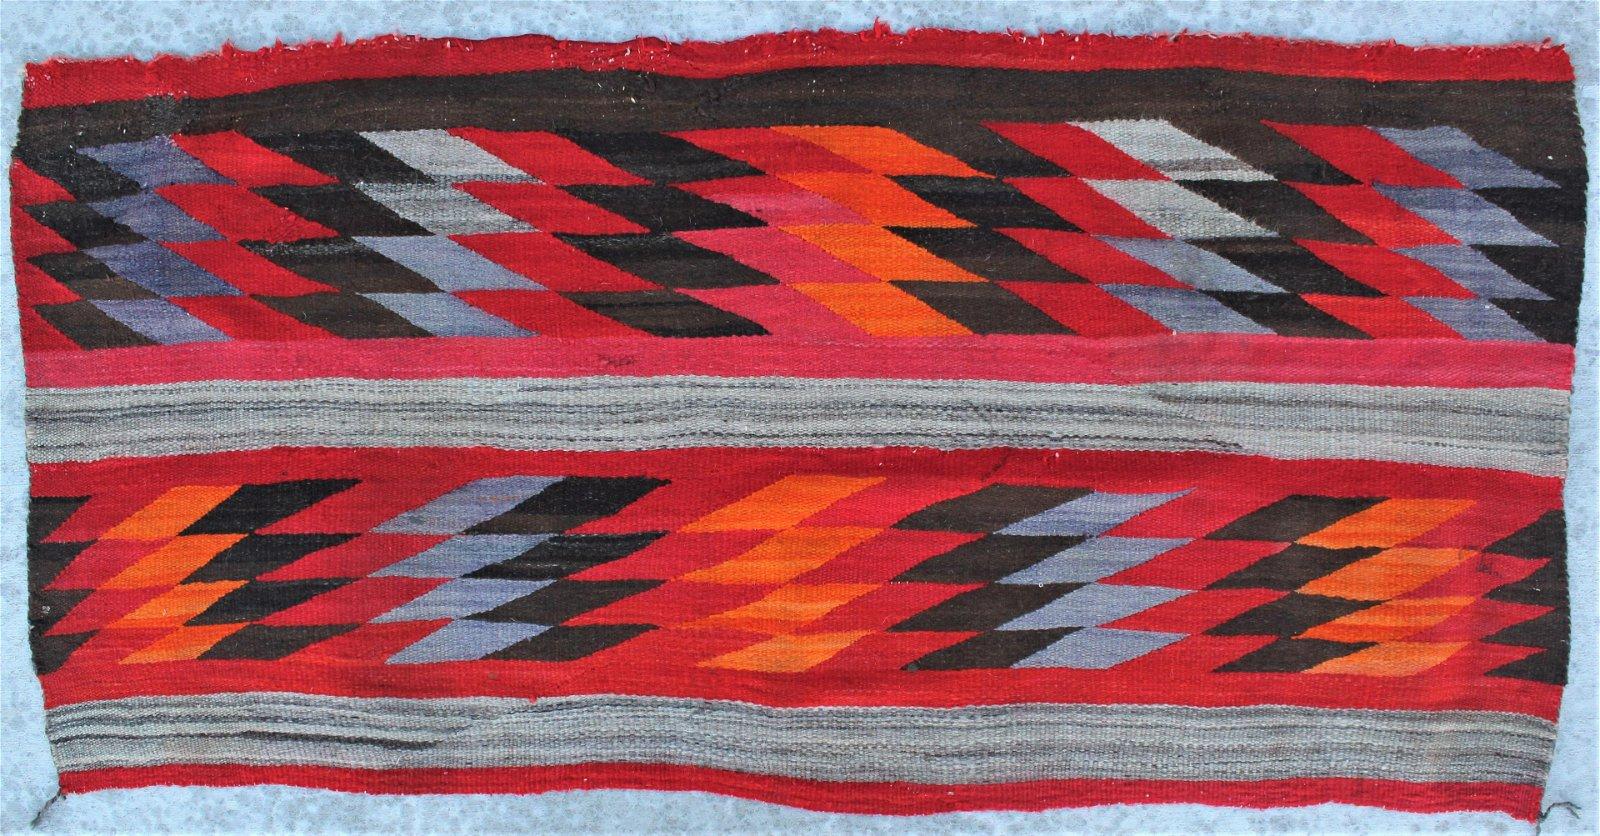 Navajo Childs Wearing Blanket